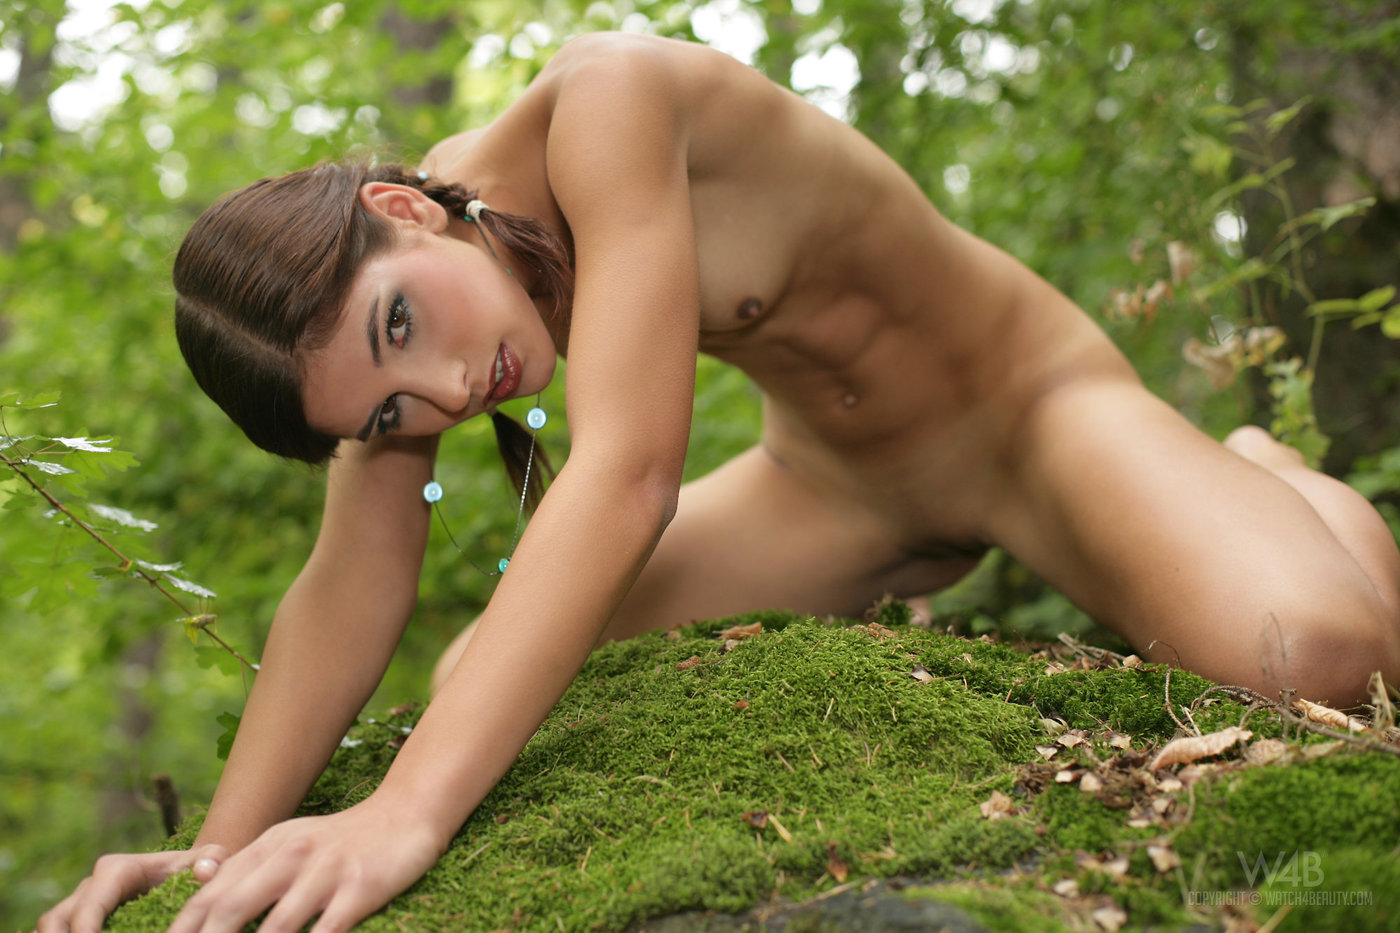 Nude Fem Joy Pics